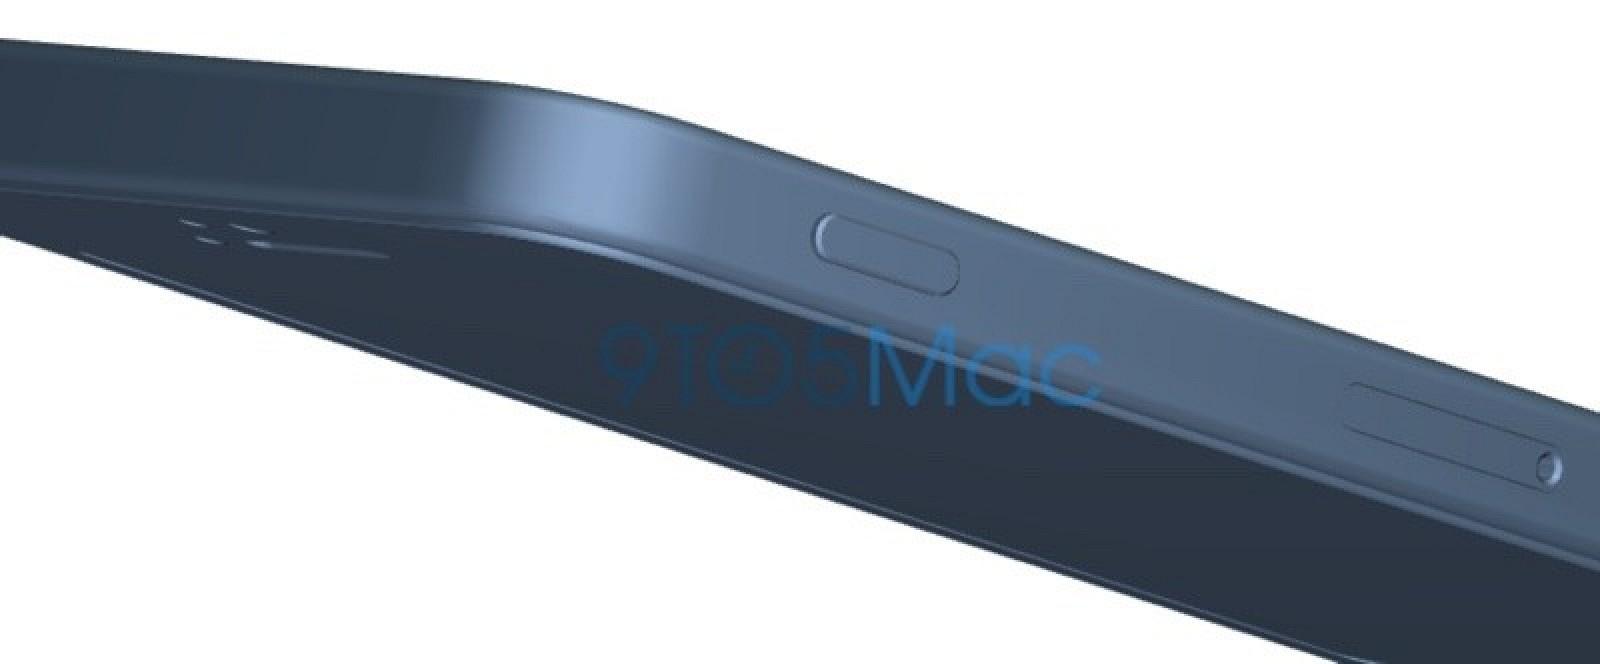 dizayn-iphone-5se-budet-identichen-iphone-5s-foto